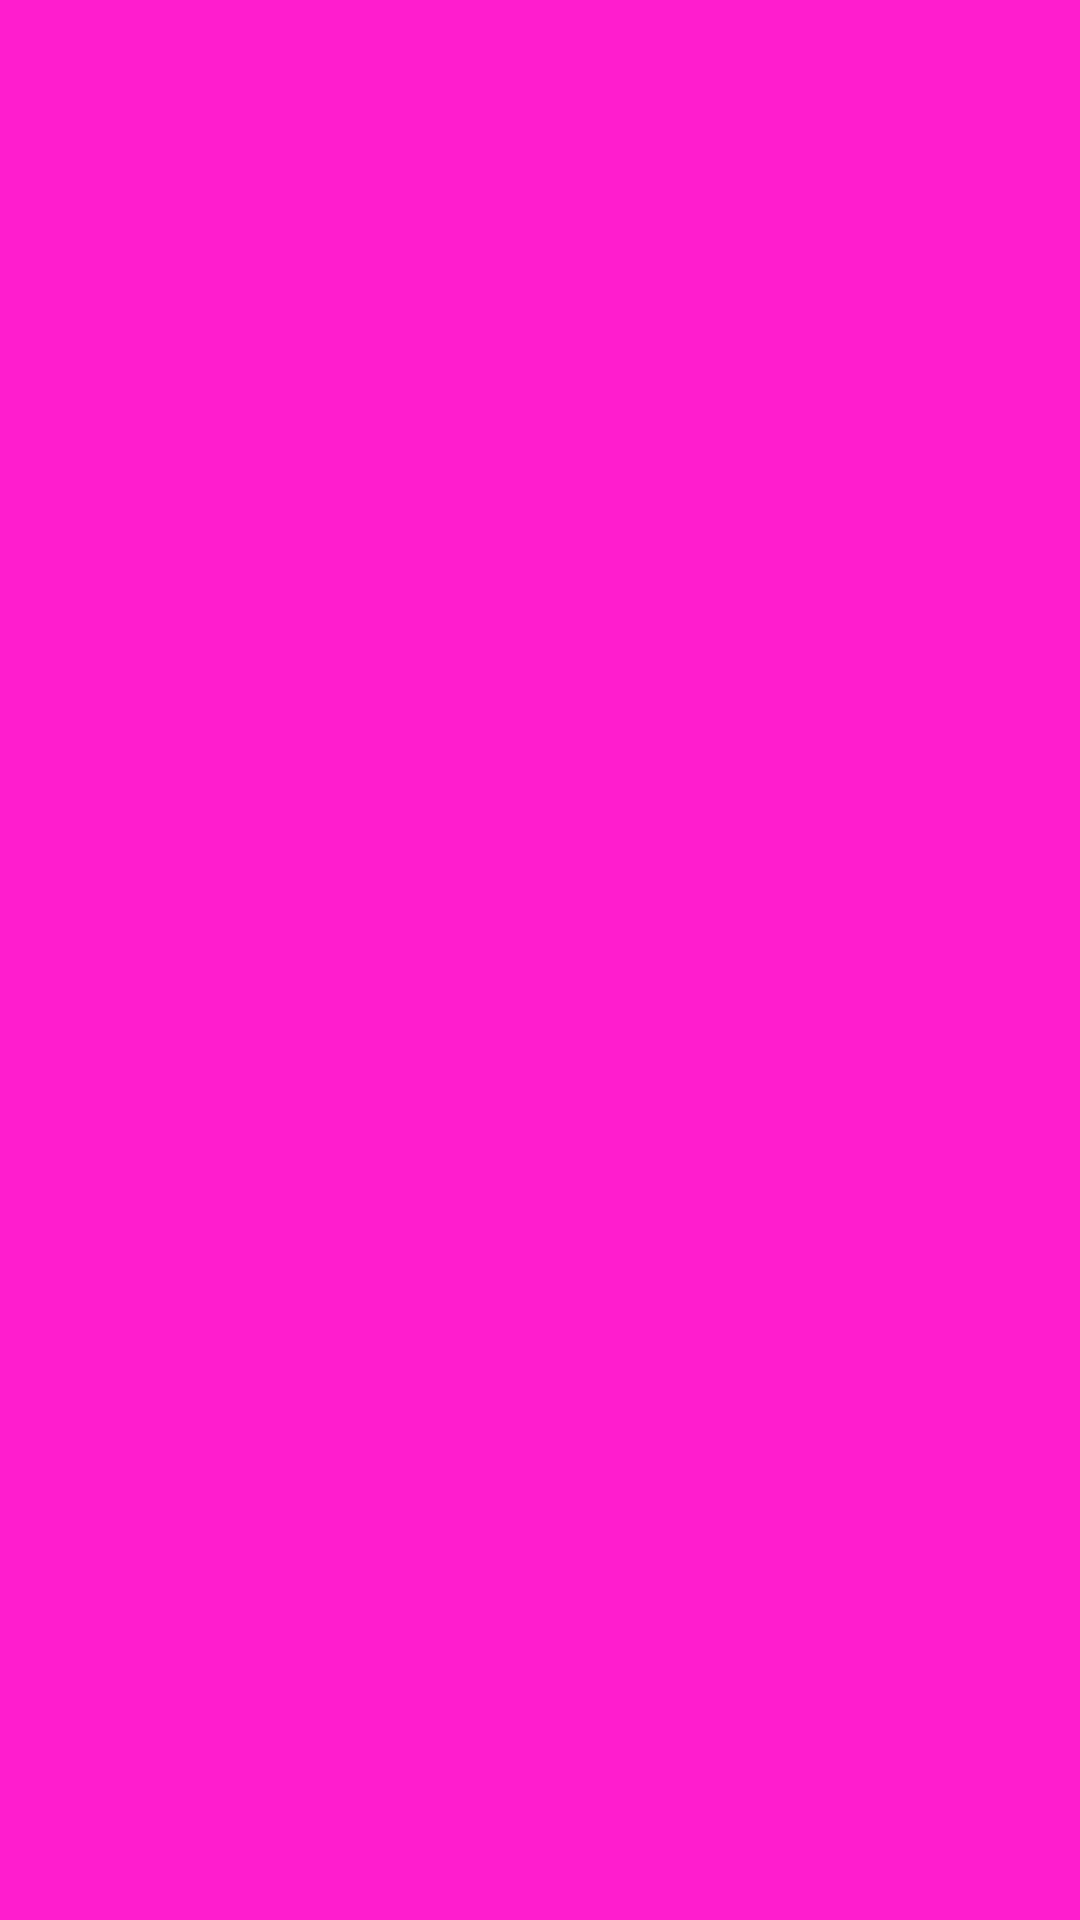 1080x1920 Hot Magenta Solid Color Background